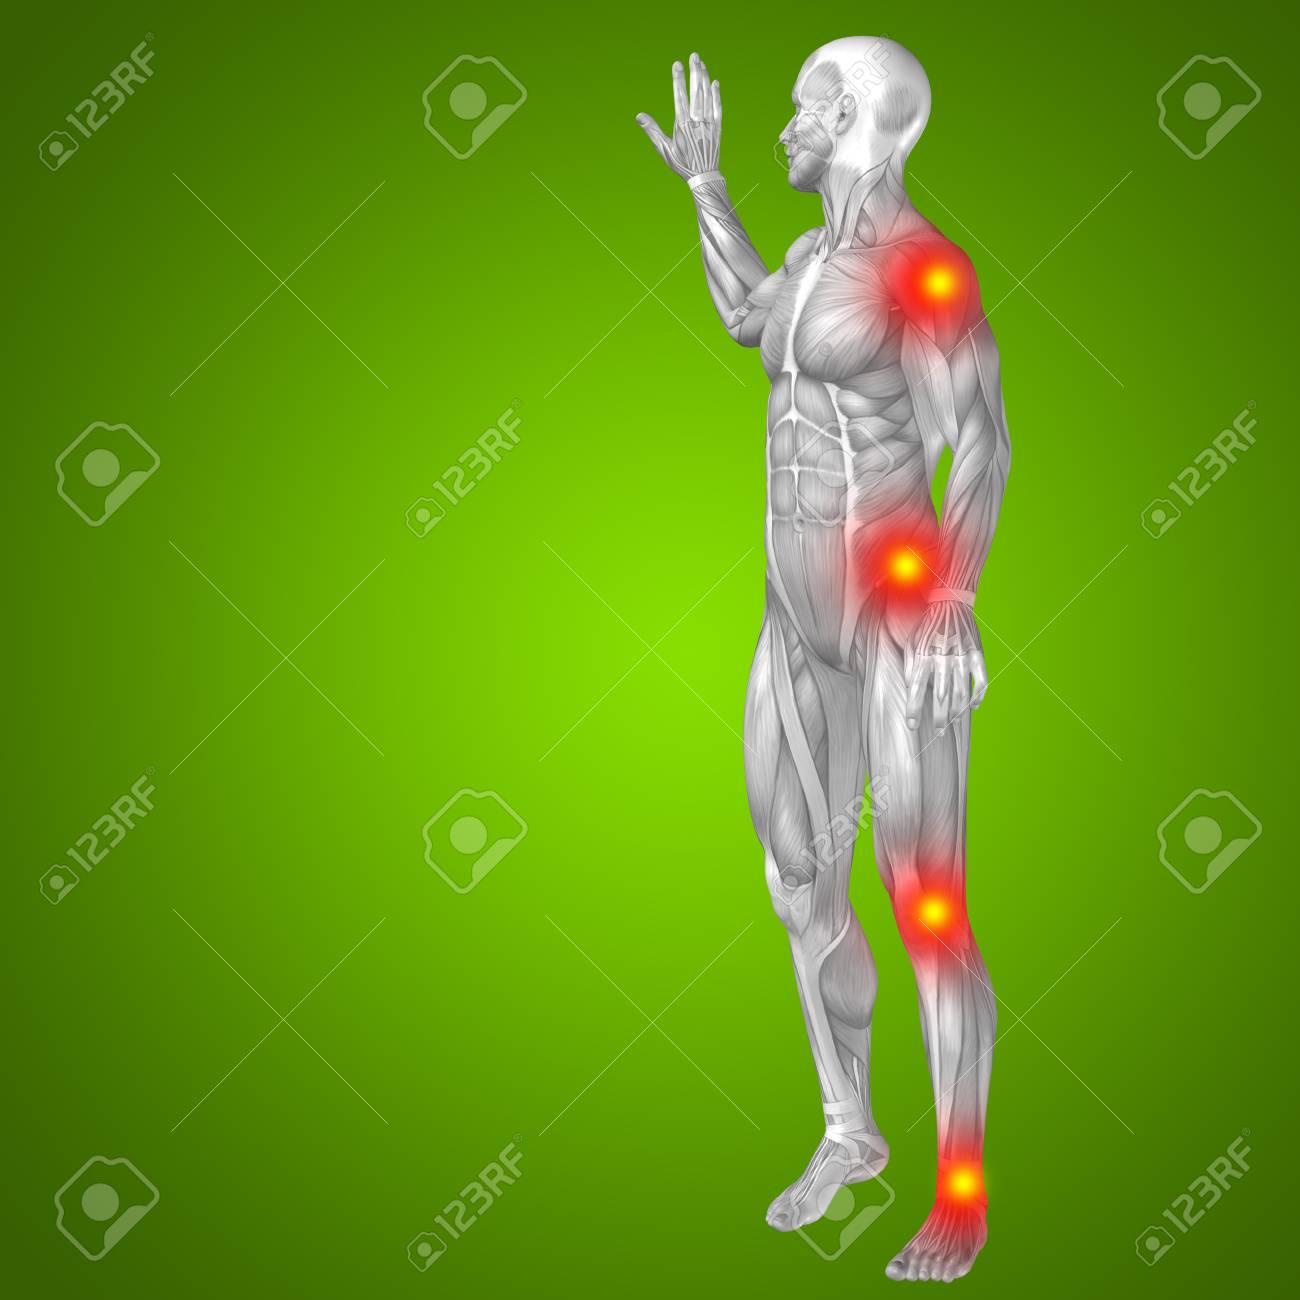 Encantador Anatomía Uña Humana Friso - Ideas Para Pintar Uñas - knxc ...